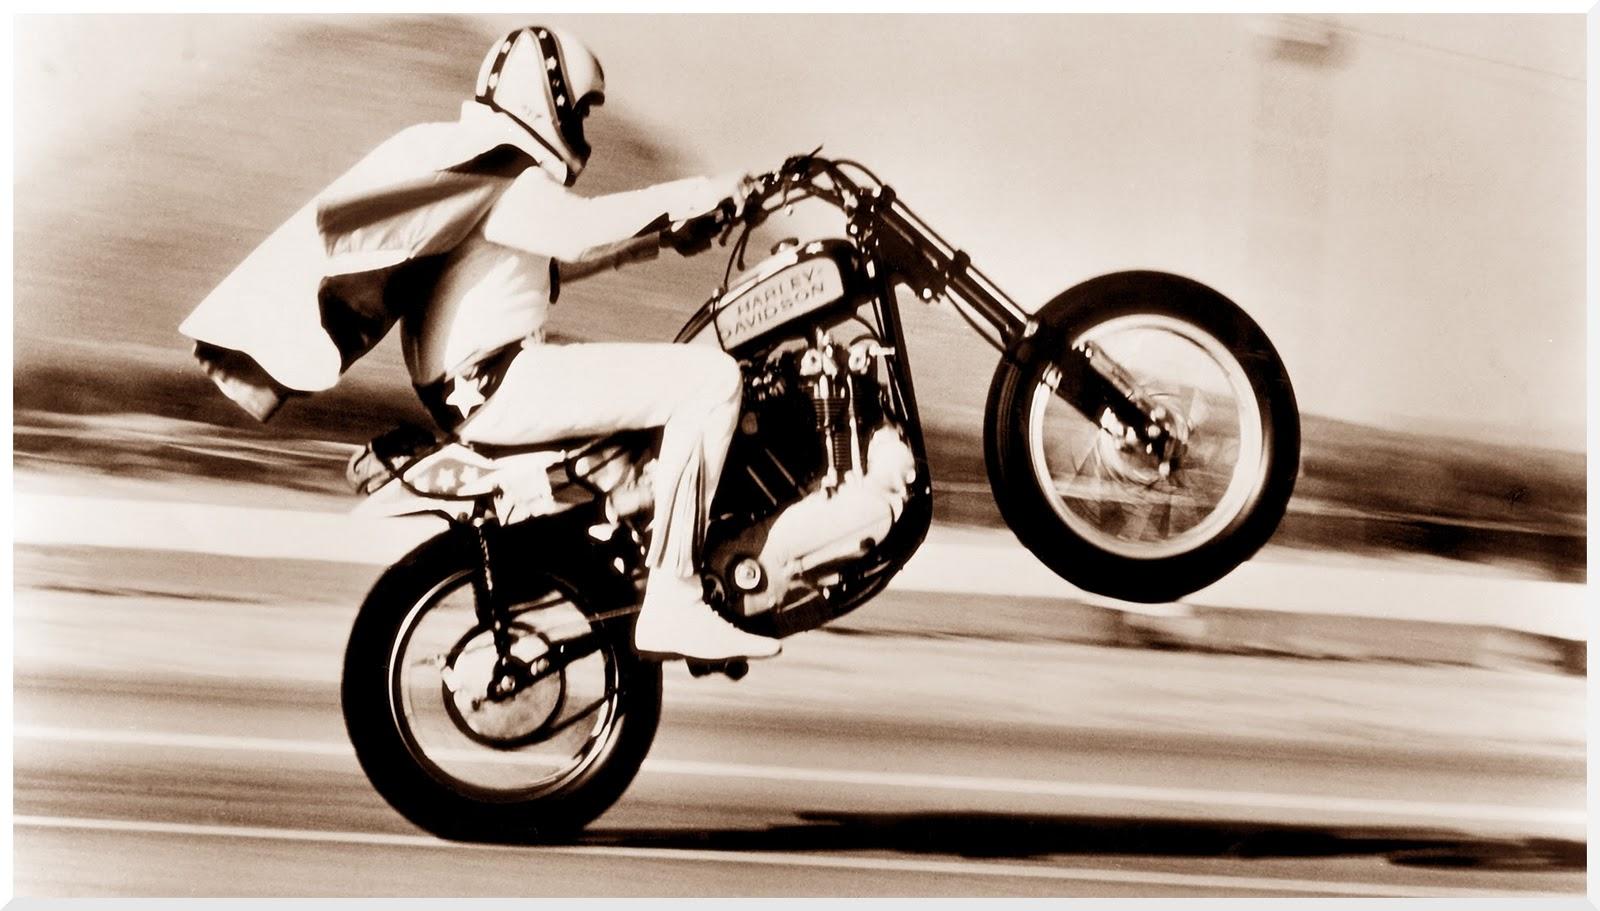 CaraibiRockers: Evel Knievel